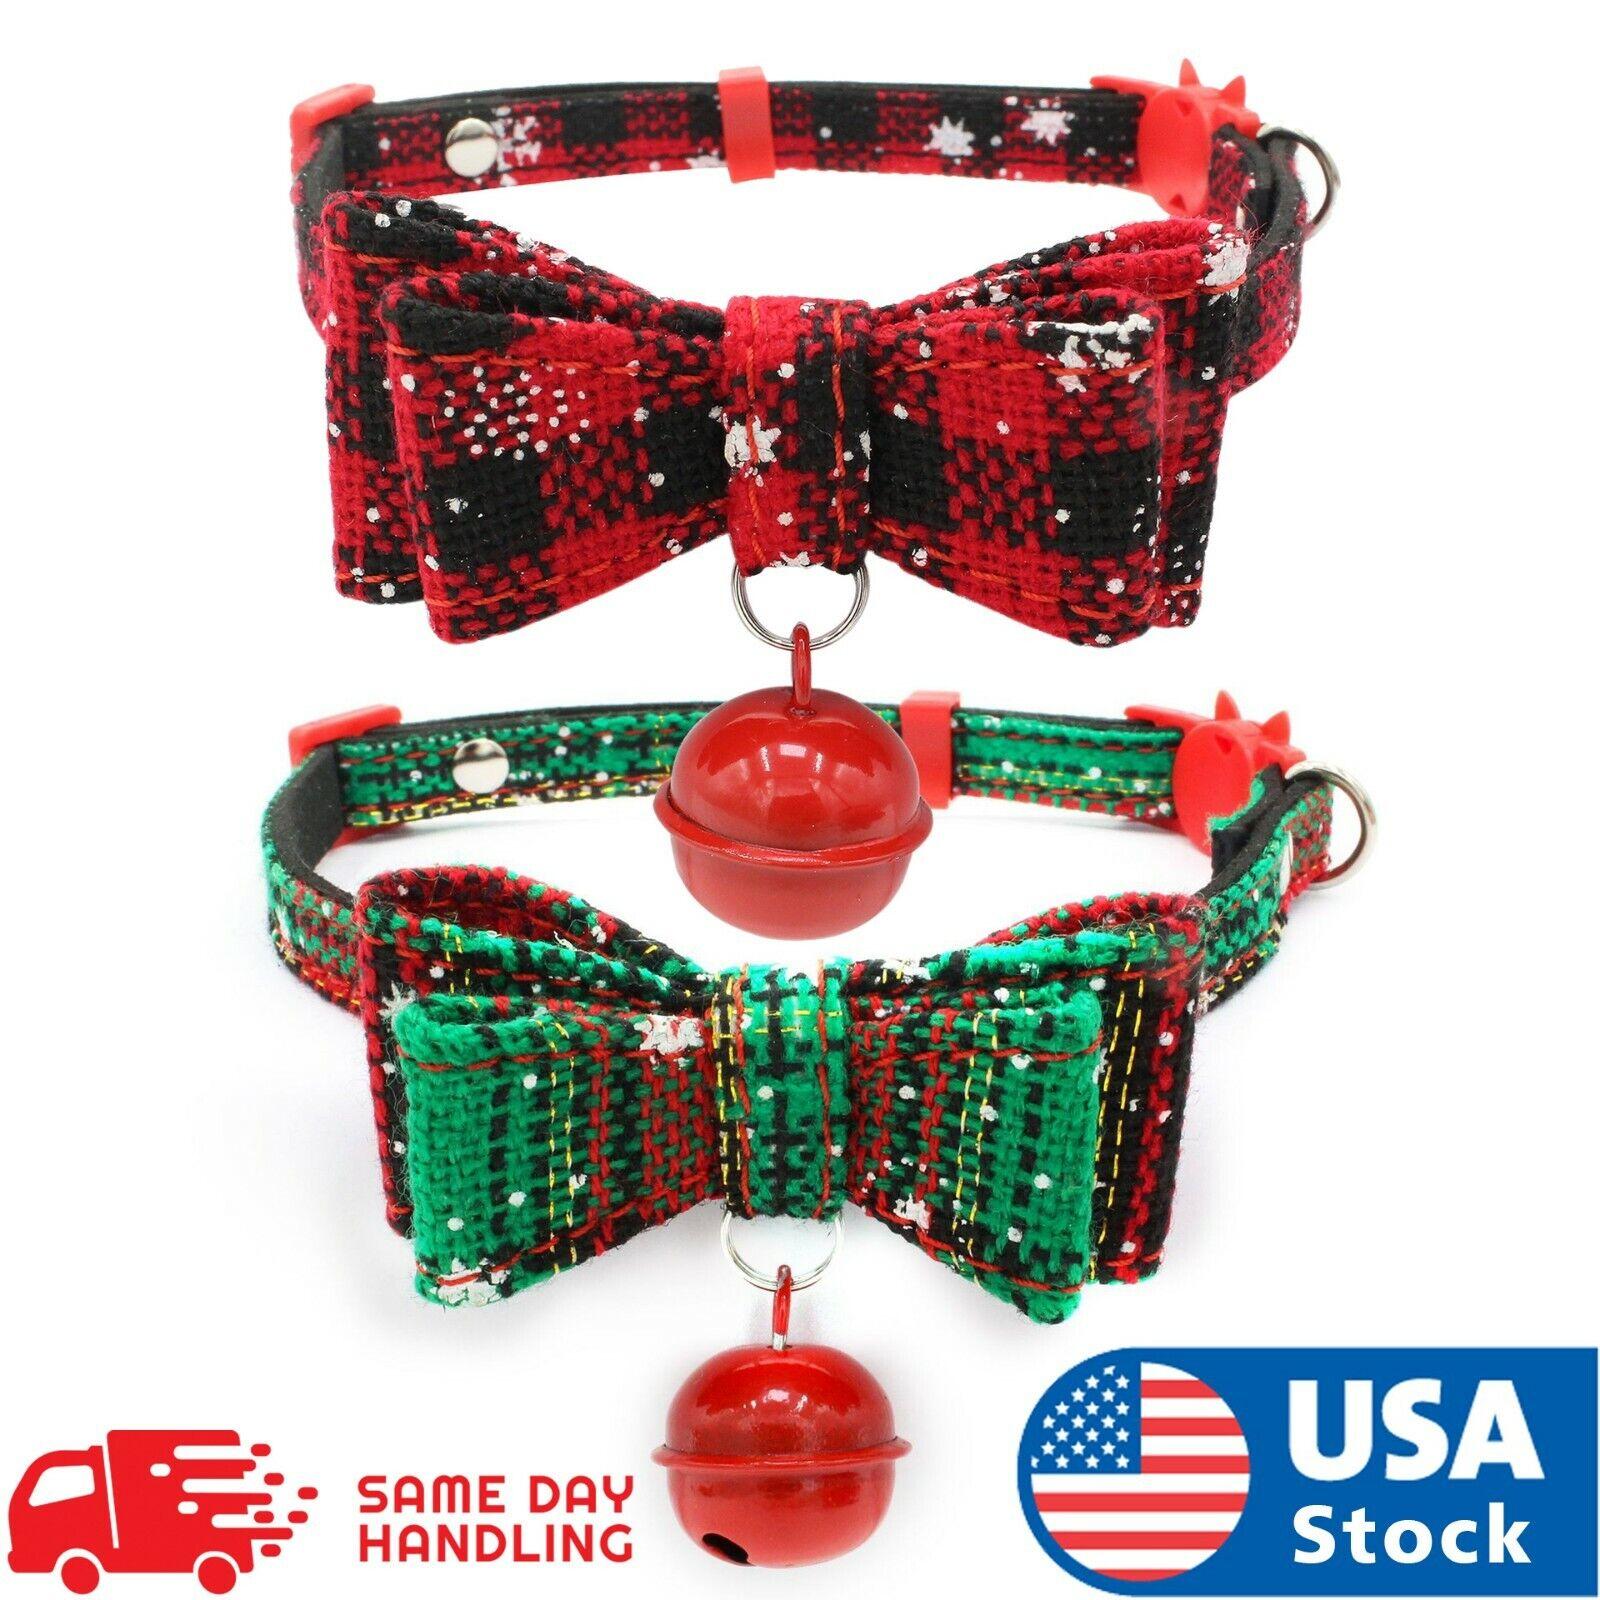 Christmas Dog Cat Pet Puppy Bowknot Necktie Break away Collar Bow Tie Necklace Collars